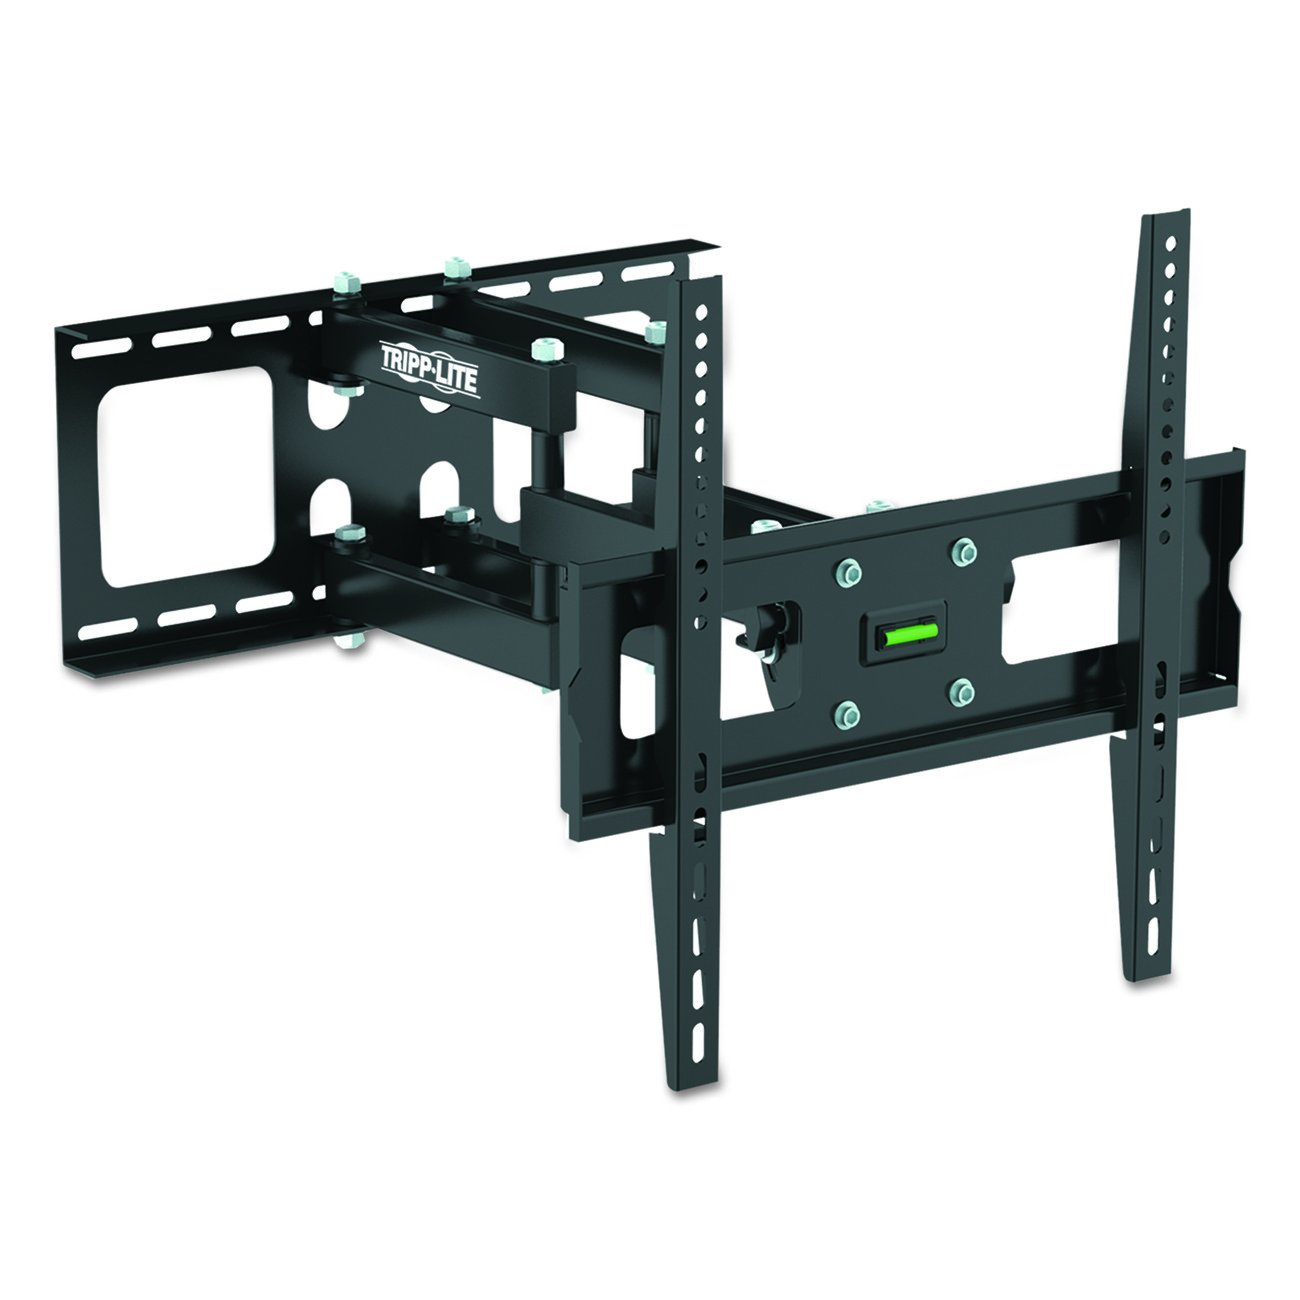 Tripp Lite Swivel/Tilt Wall Mount with Arm for 26'' to 55'' TVs, Monitors, Flat Screens, LED, Plasma or LCD Displays (DWM2655M)